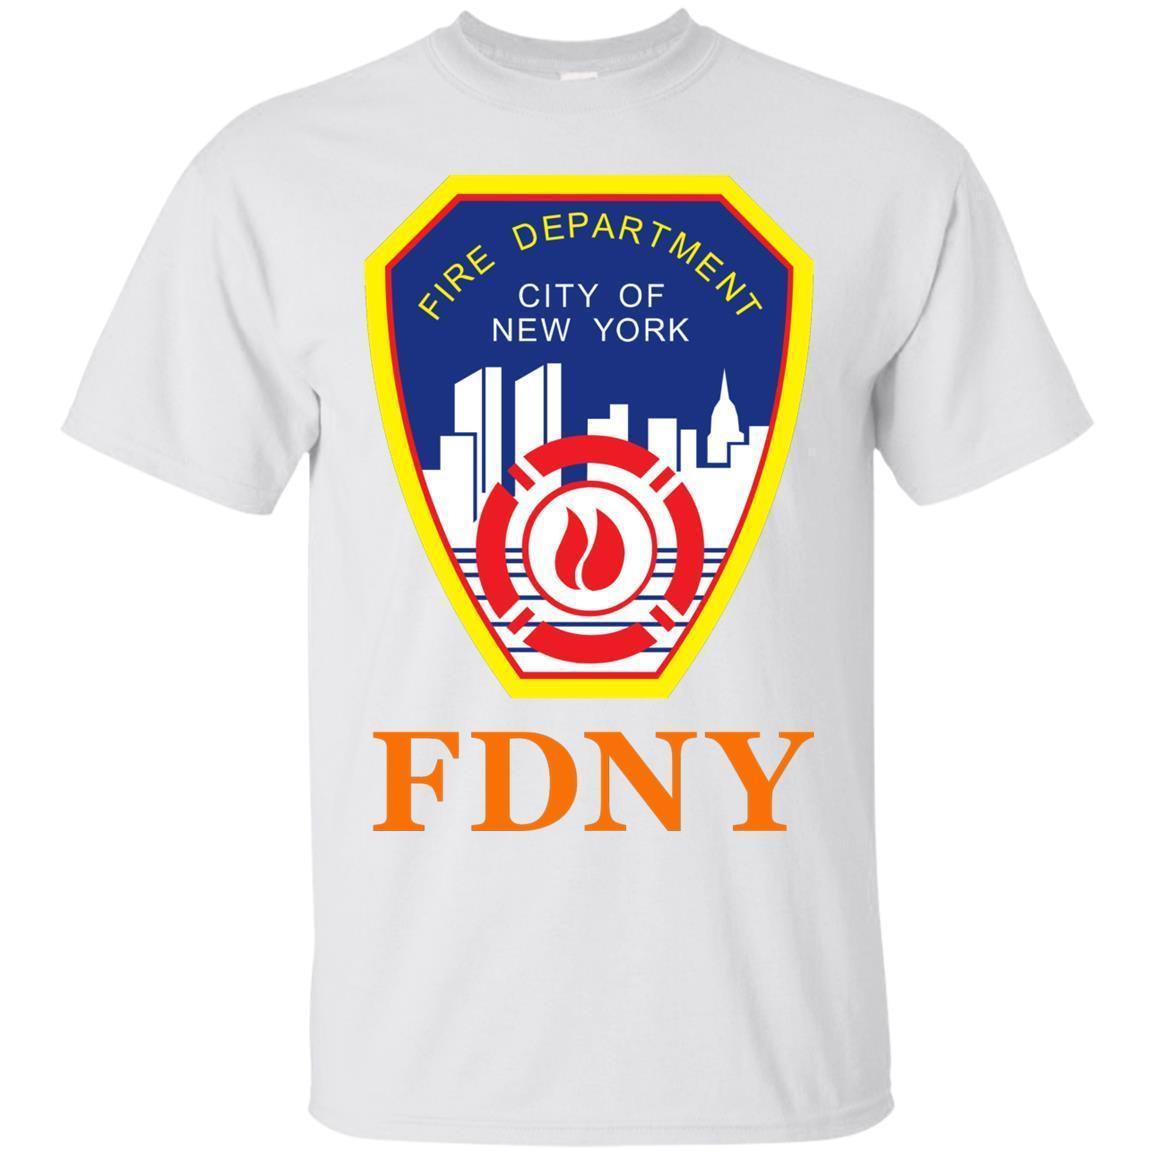 FDNY SHIRT – FIREFIGHTER DEPARTMENT CITY OF NEW YORK – T-Shirt